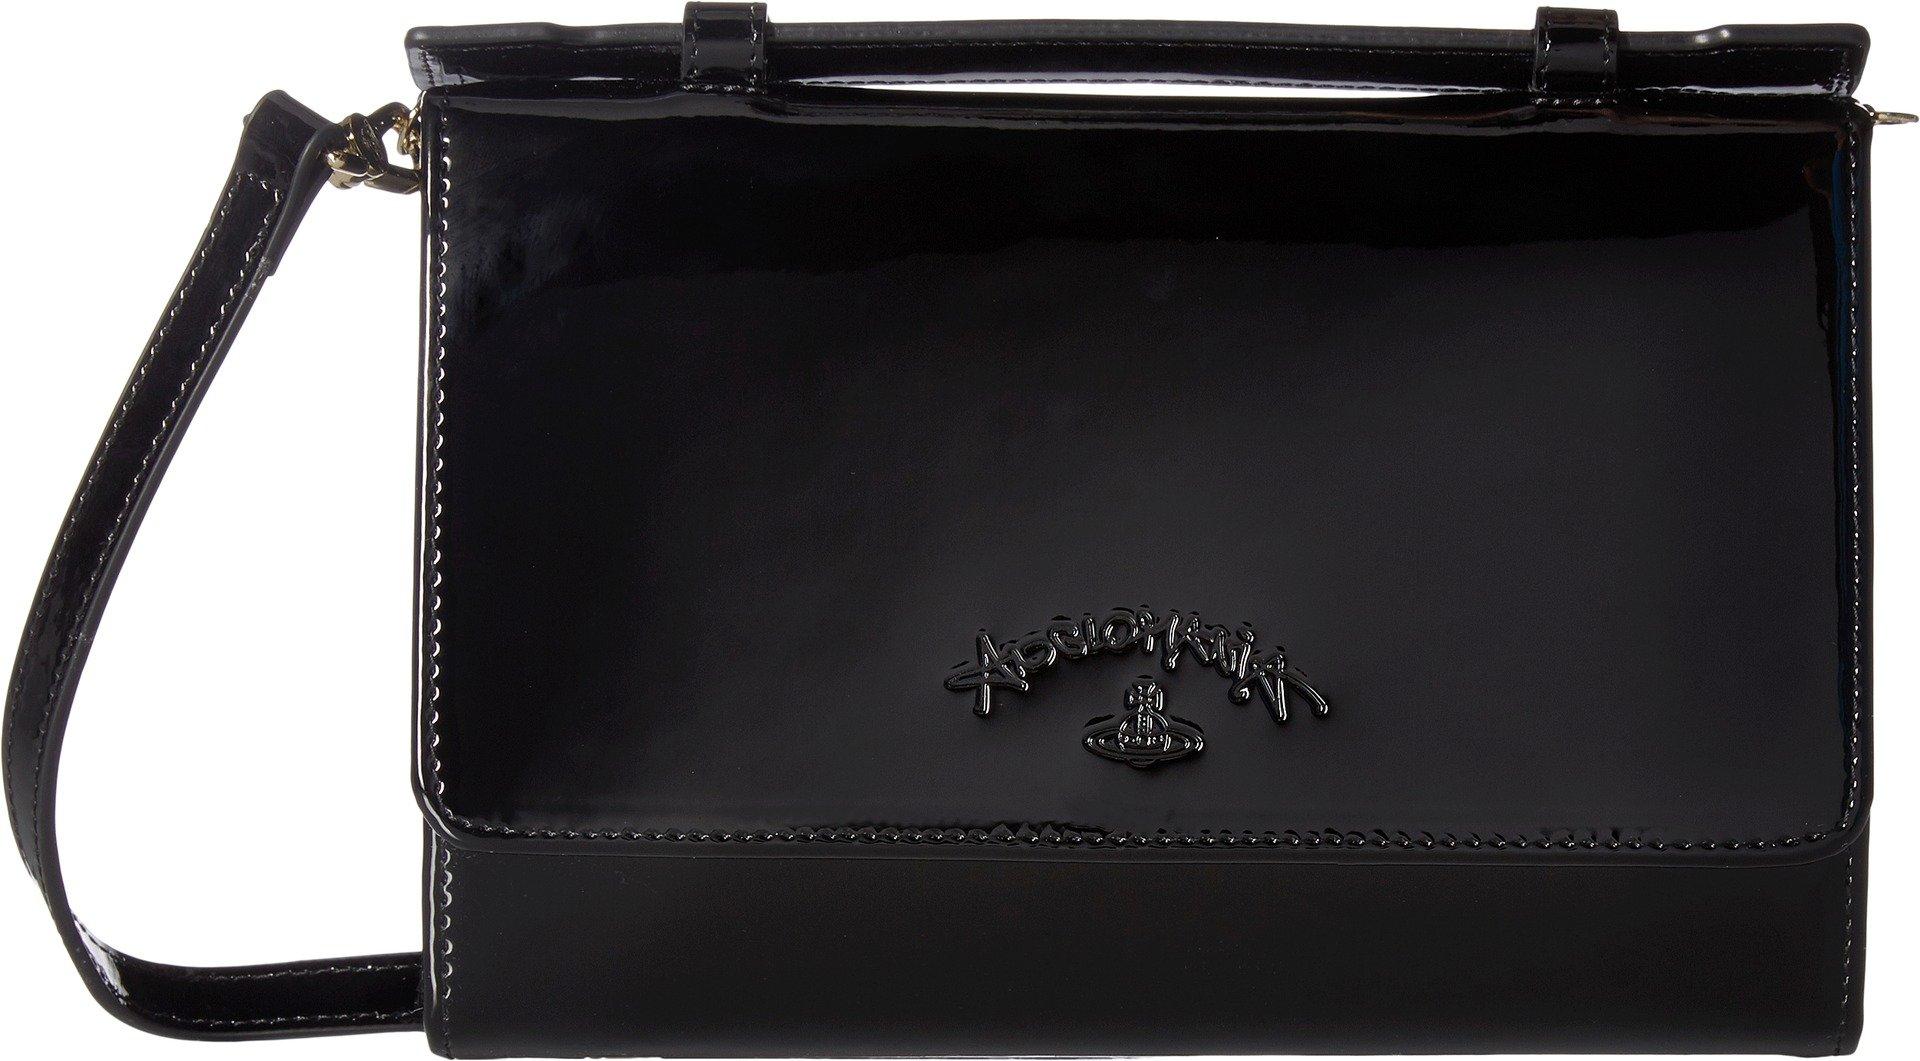 Vivienne Westwood Women's Travel Wallet Black One Size